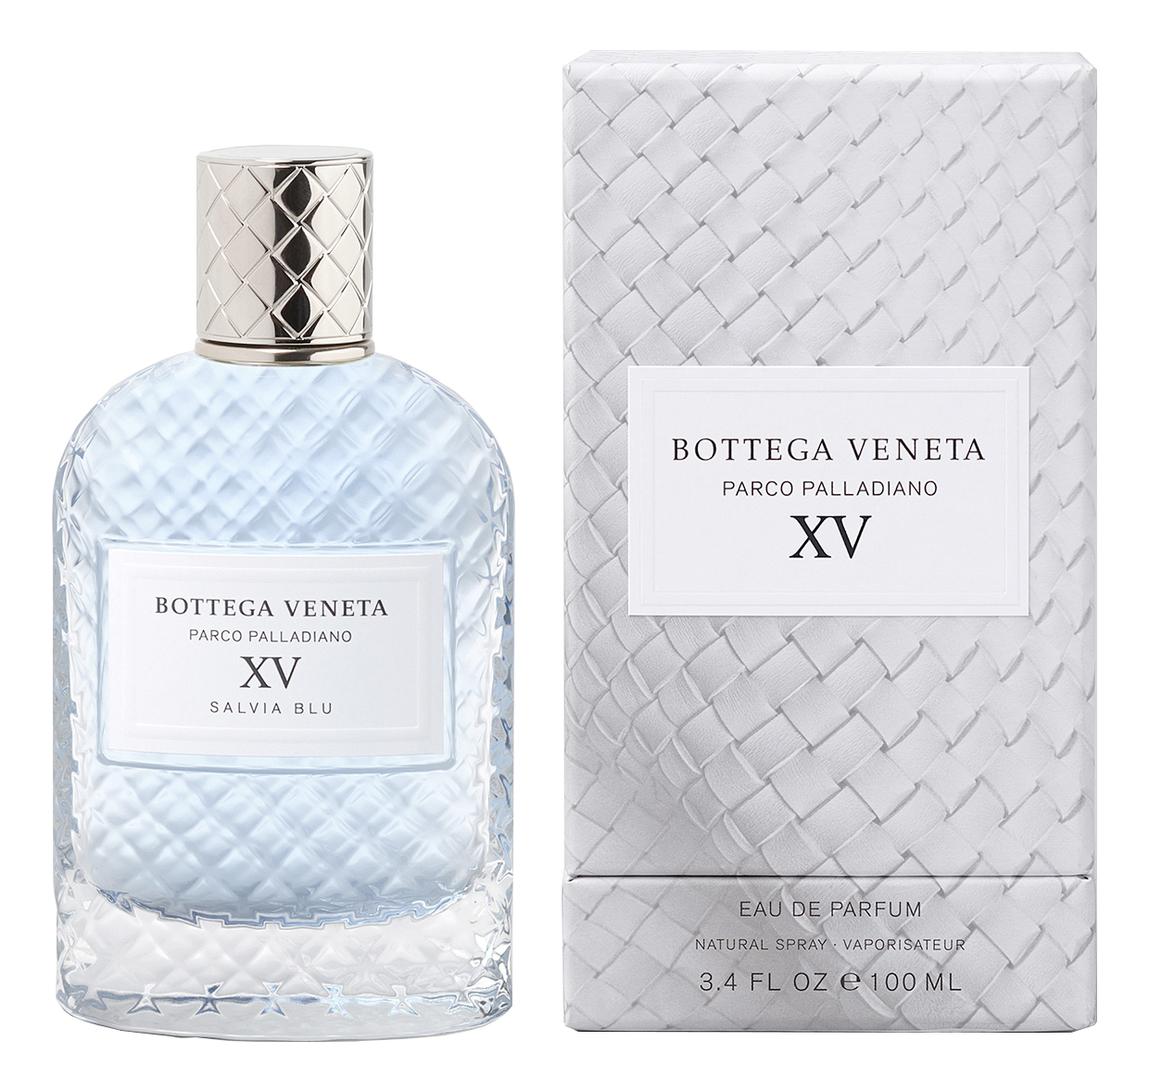 Bottega Veneta Parco Palladiano XV Salvia Blu: парфюмерная вода 100мл bottega veneta parco palladiano xi castagno туалетные духи тестер 100 мл